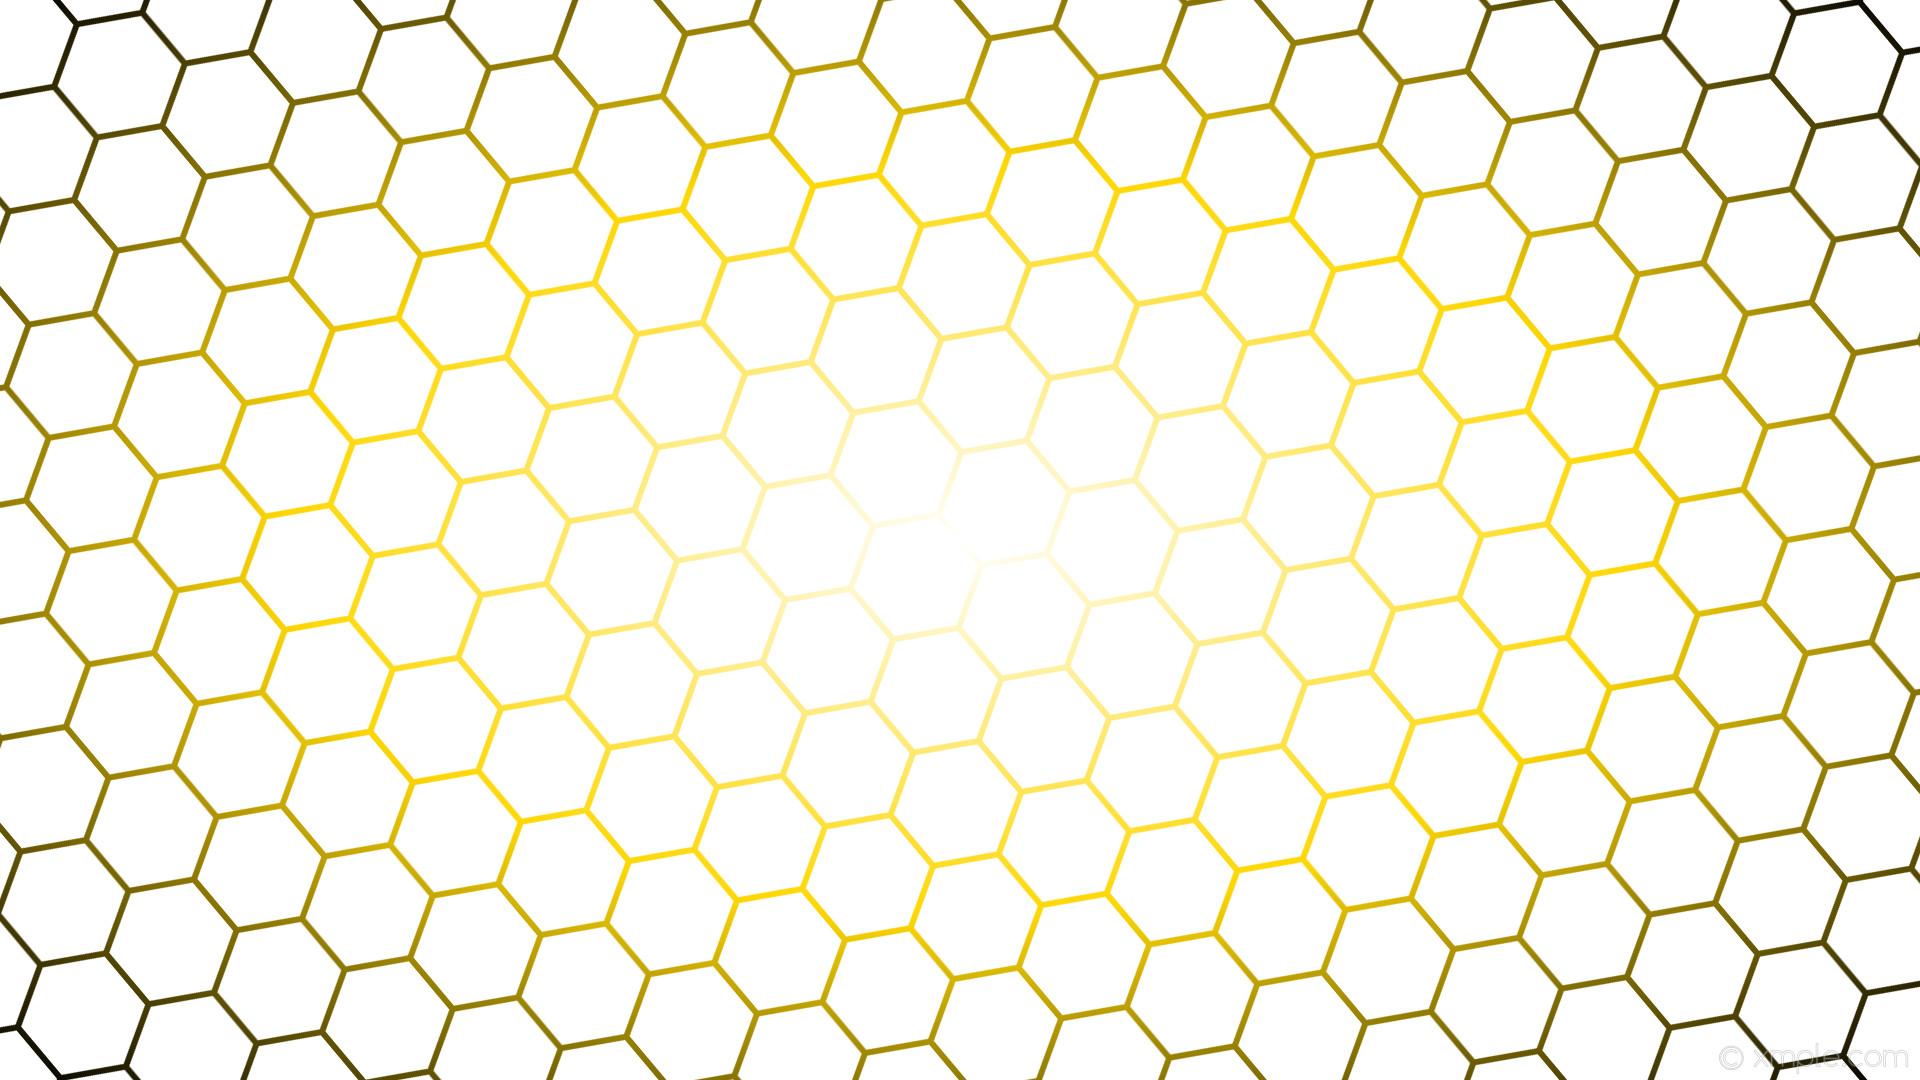 wallpaper black hexagon glow gradient yellow white gold #ffffff #ffffff  #ffd700 diagonal 40